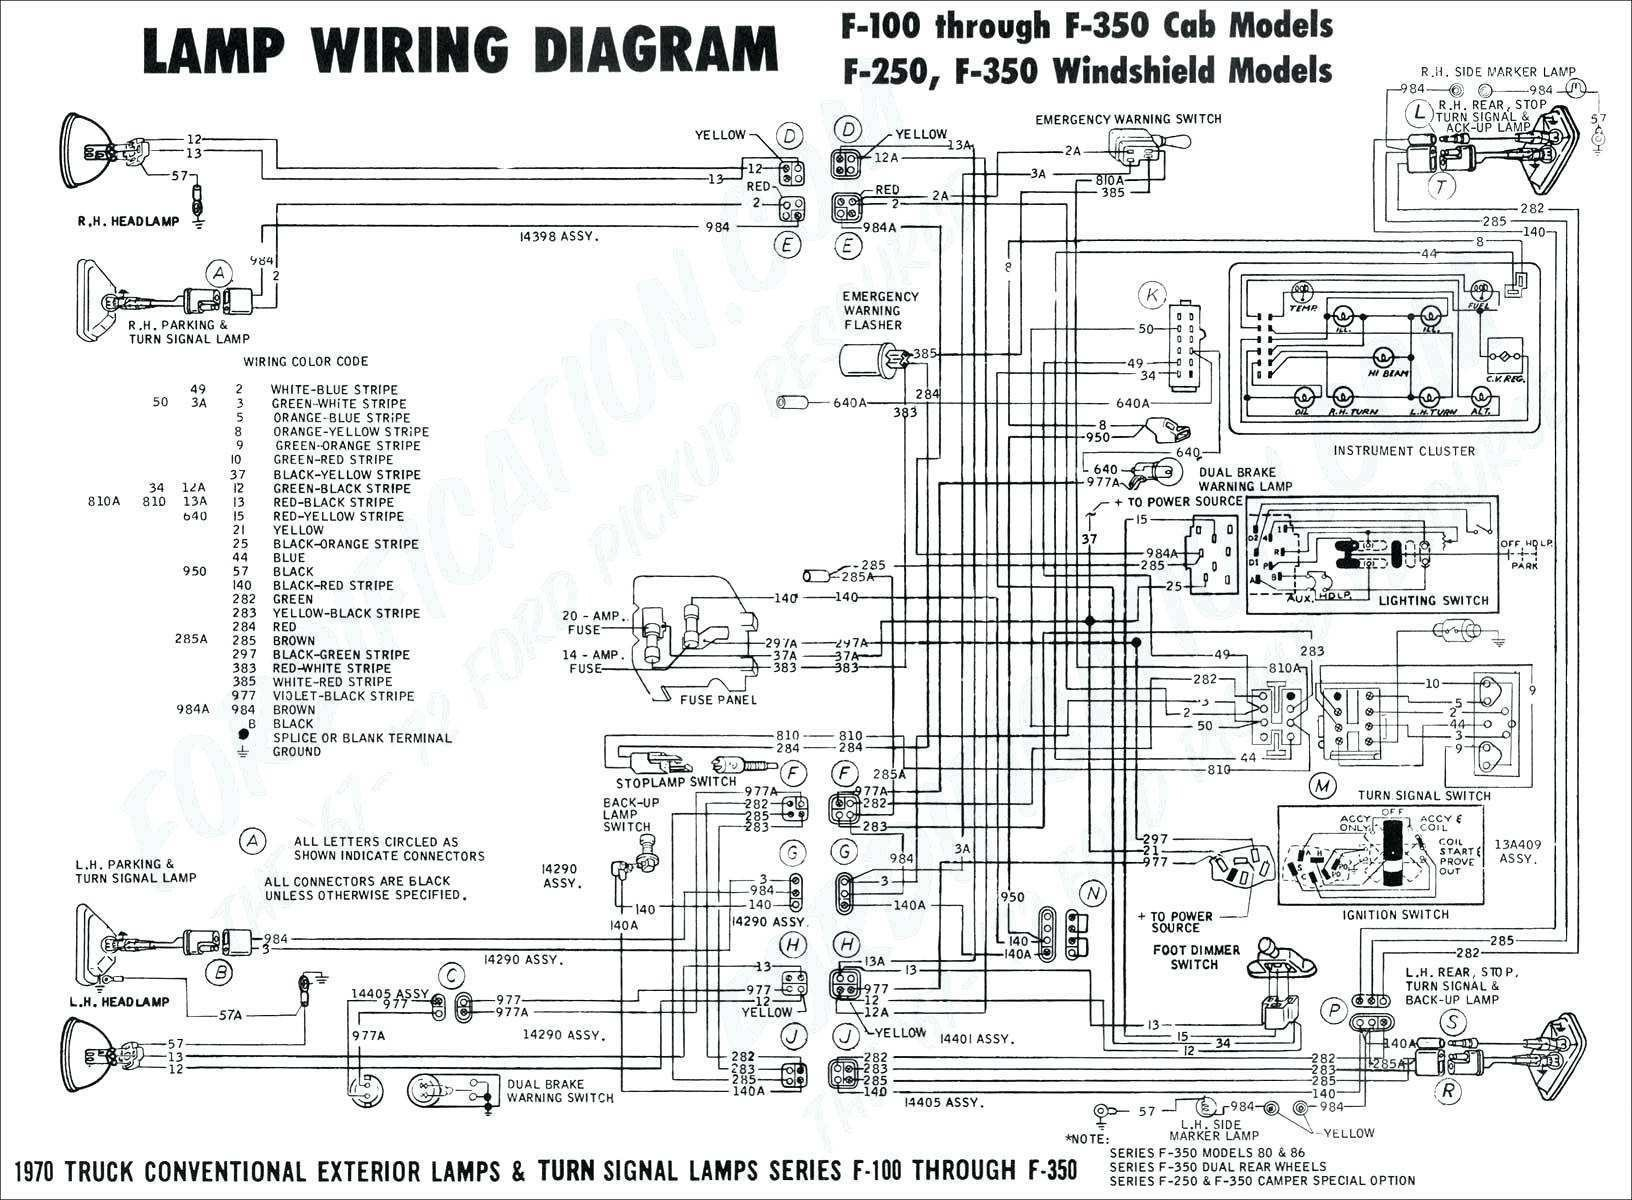 1974 Corvette Wiring Diagram from mainetreasurechest.com